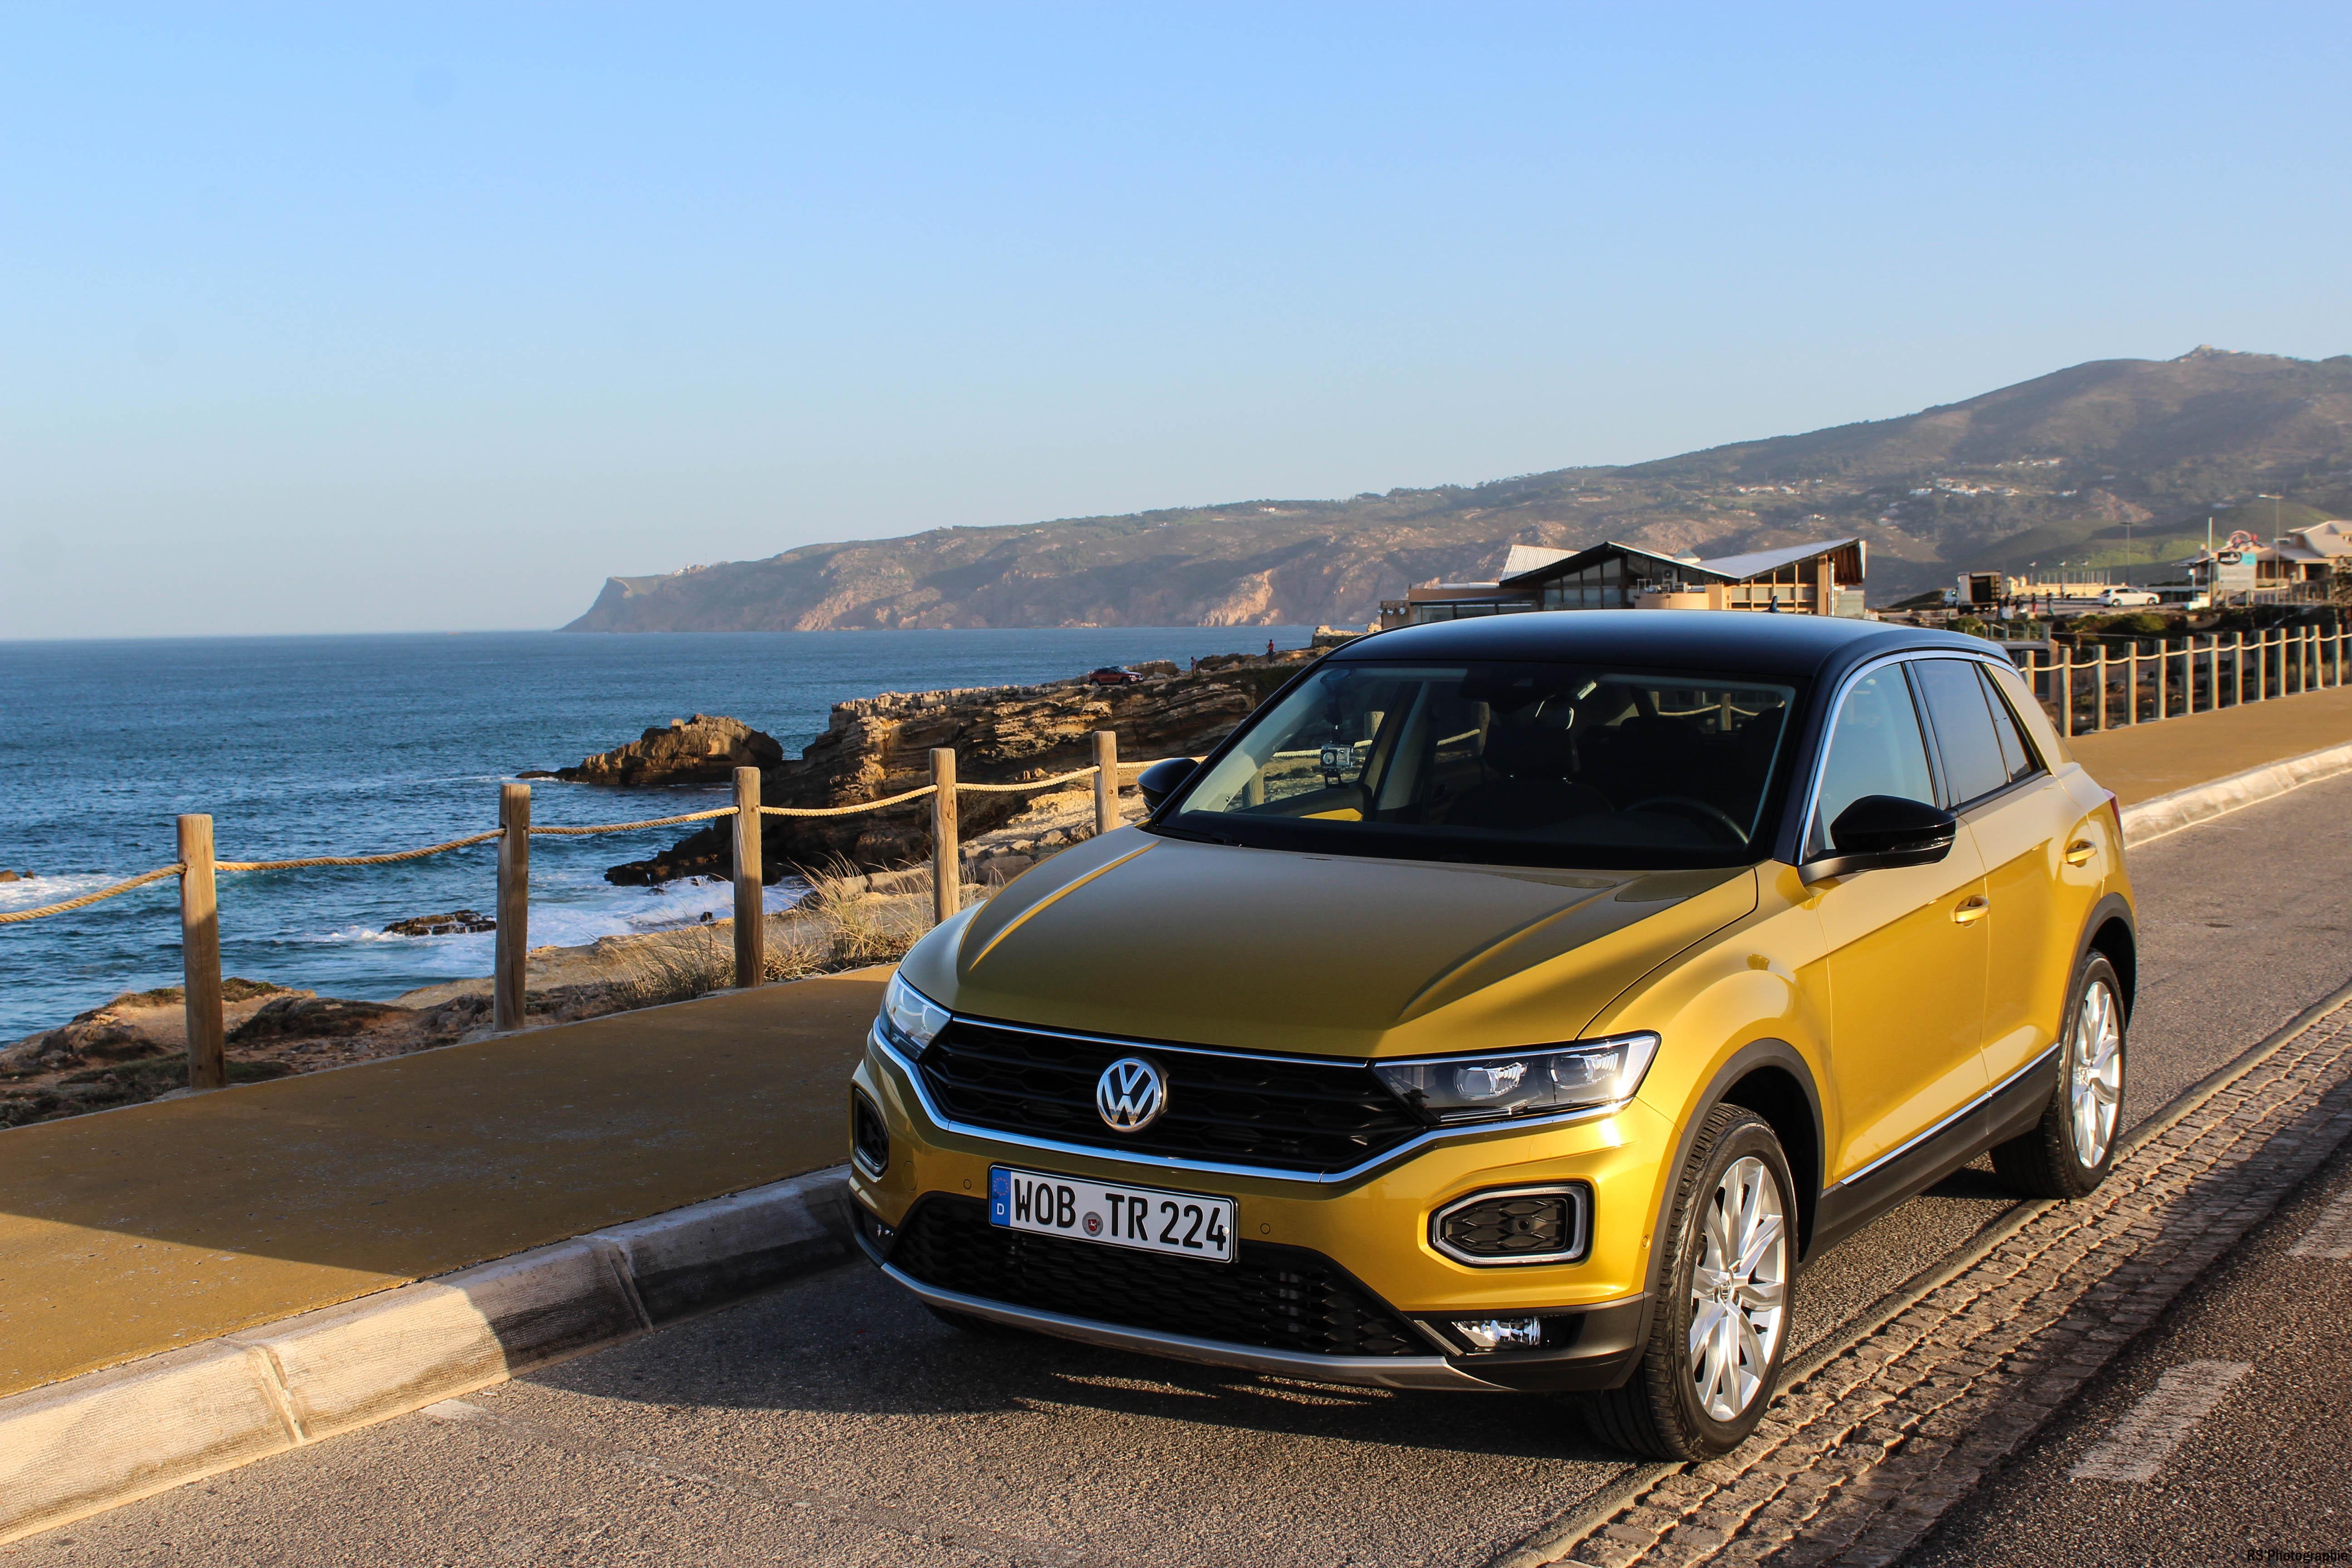 Volkswagentroc82-vw-t-roc-avant-front-Arnaud Demasier-RSPhotographie